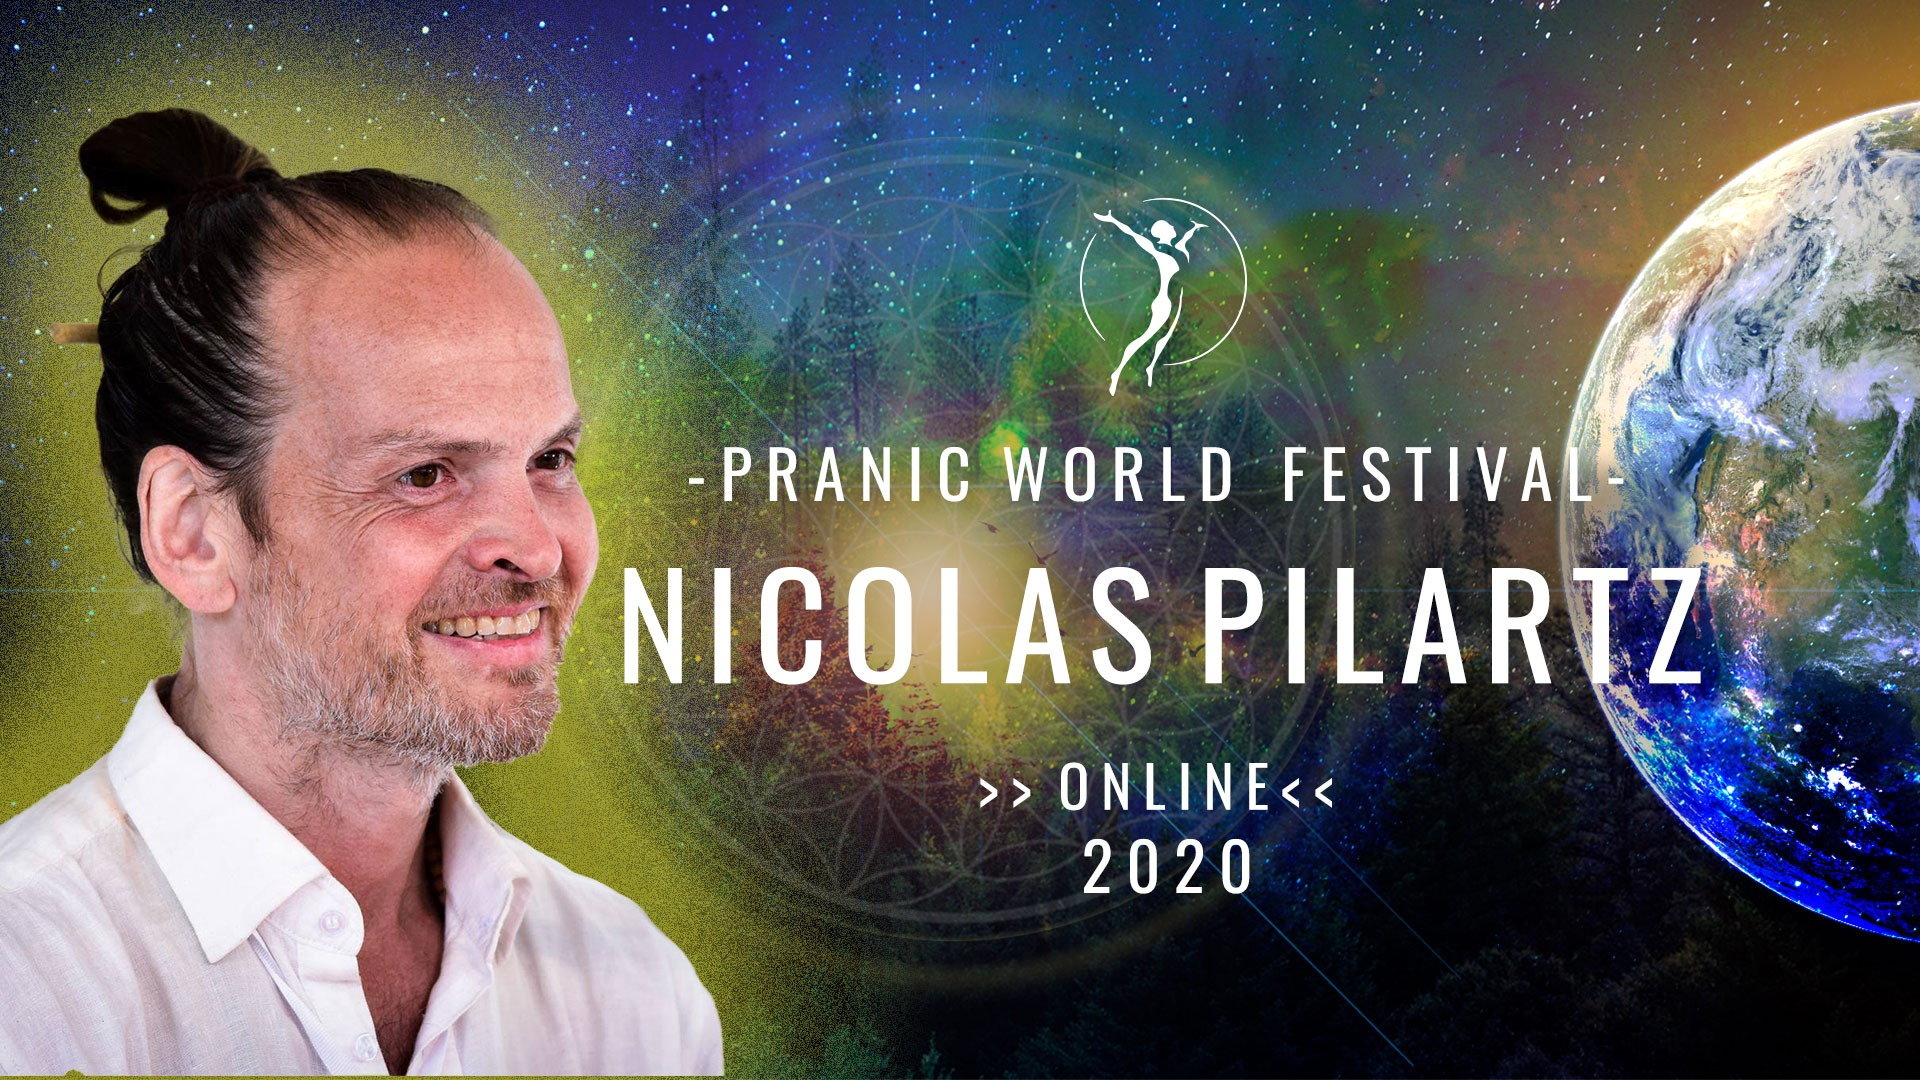 Nicolas Pilartz